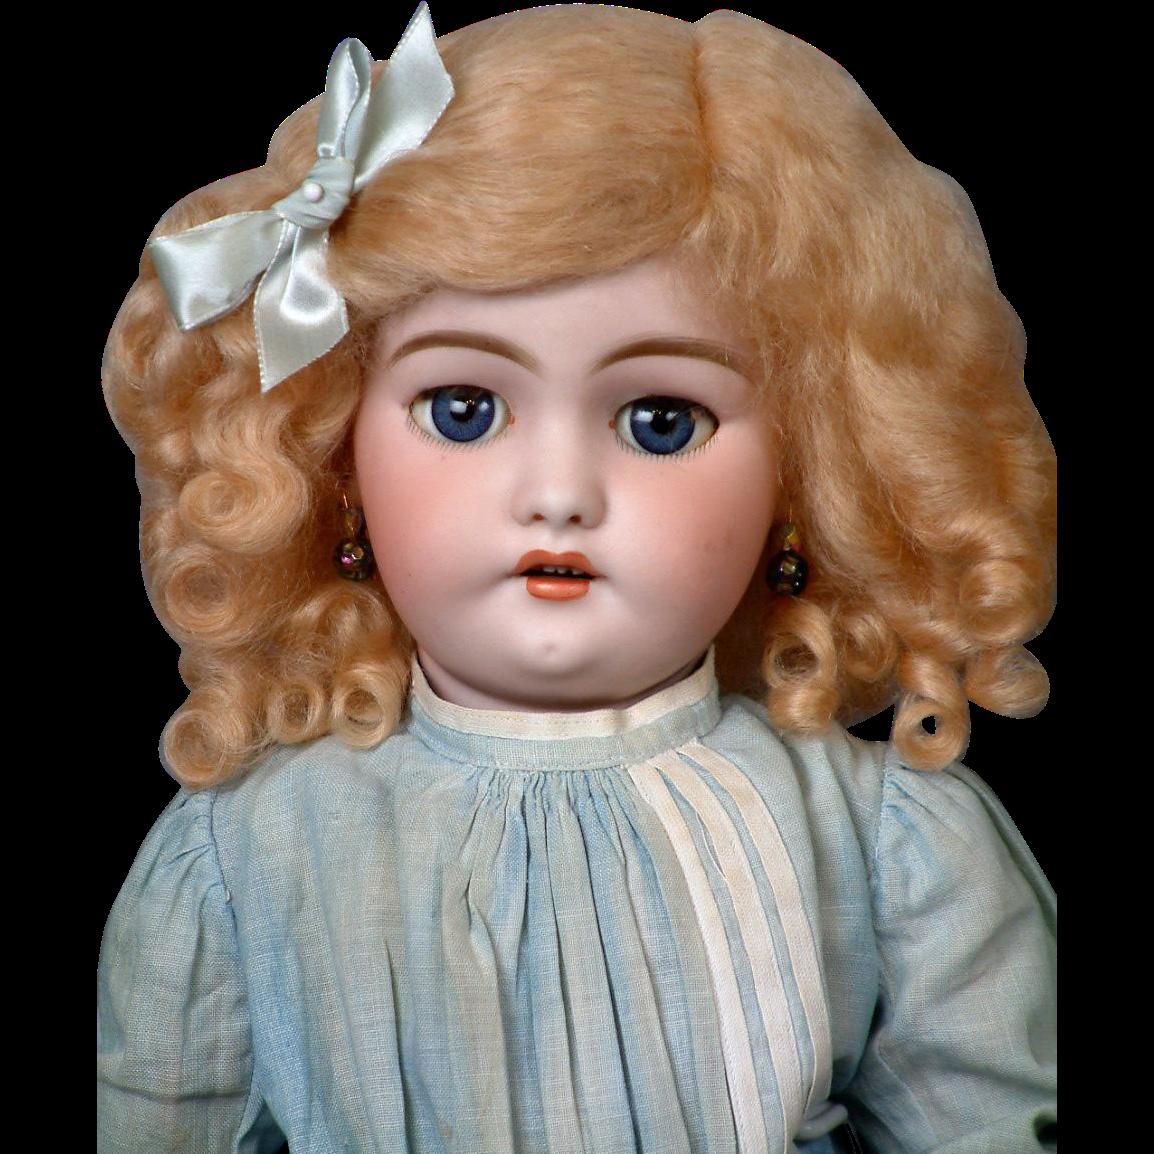 "*Golden Angel* Simon & Halbig 1039 Antique Bisque Doll 18"""